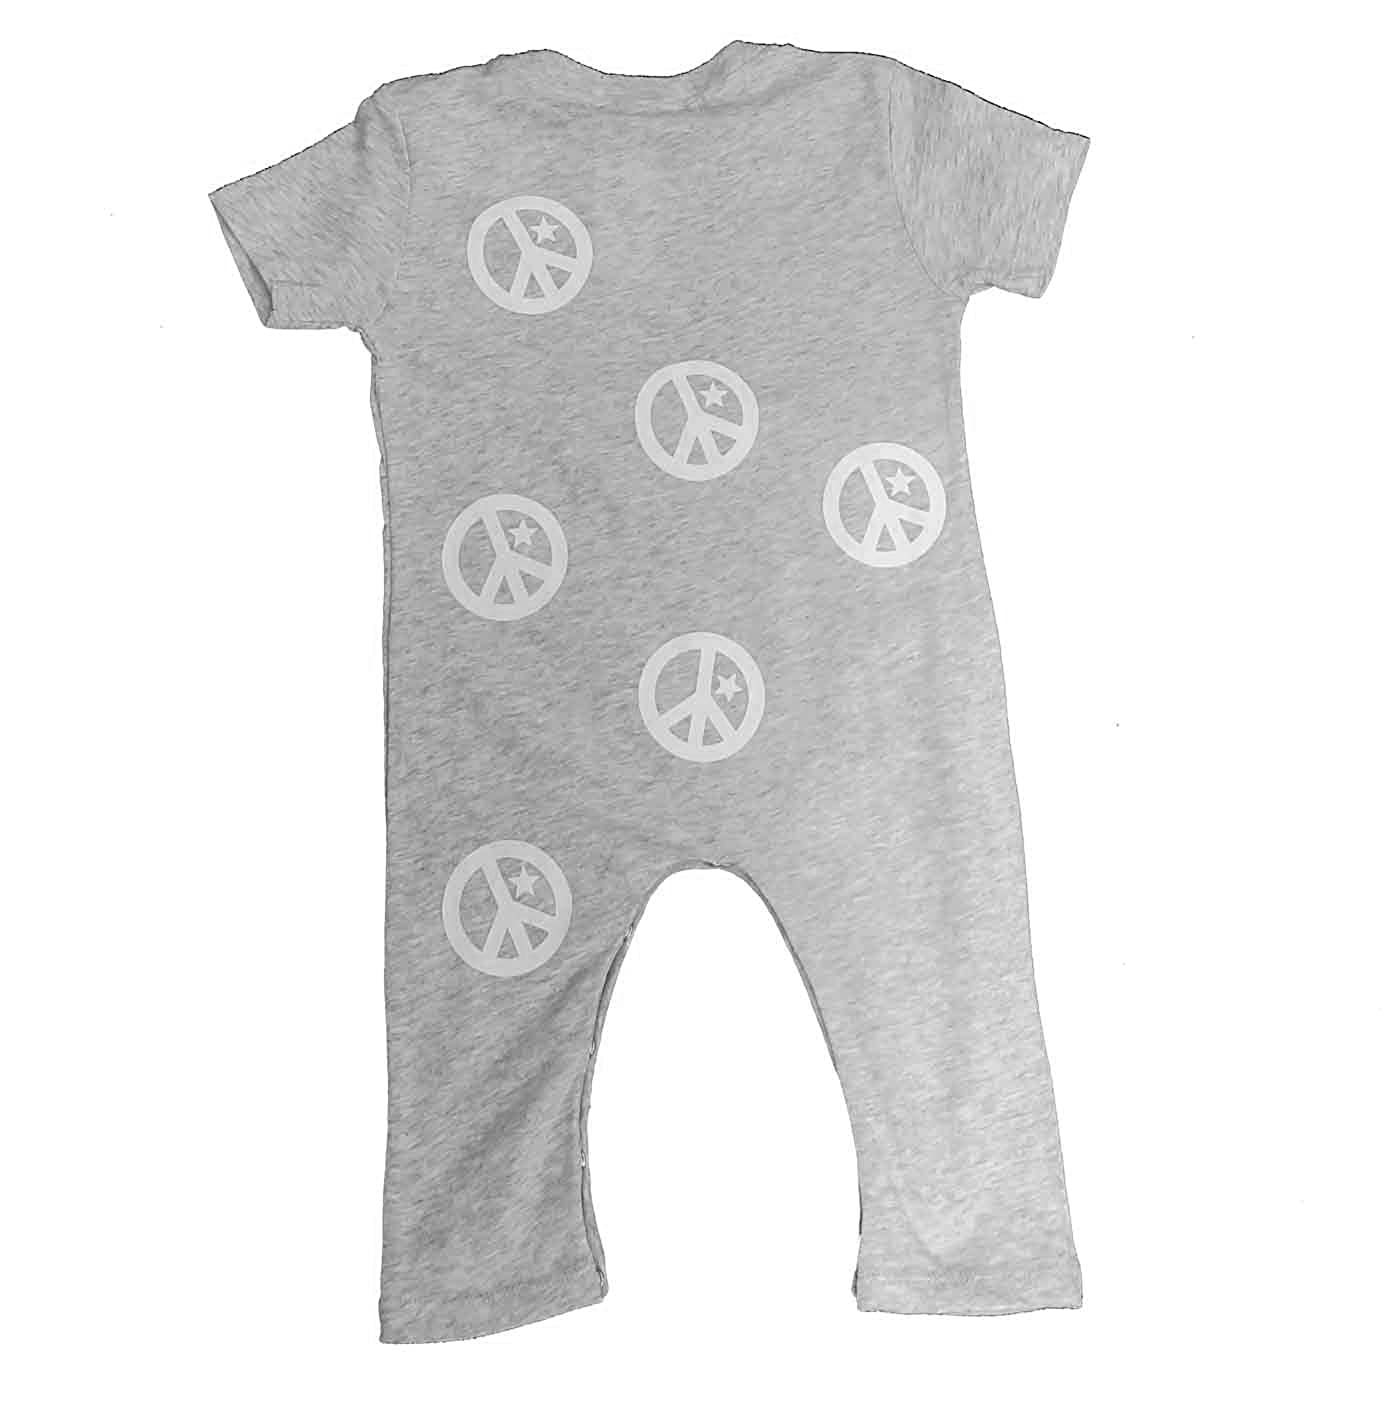 RSB Rock Star Baby by Tico Torres Bodysuit